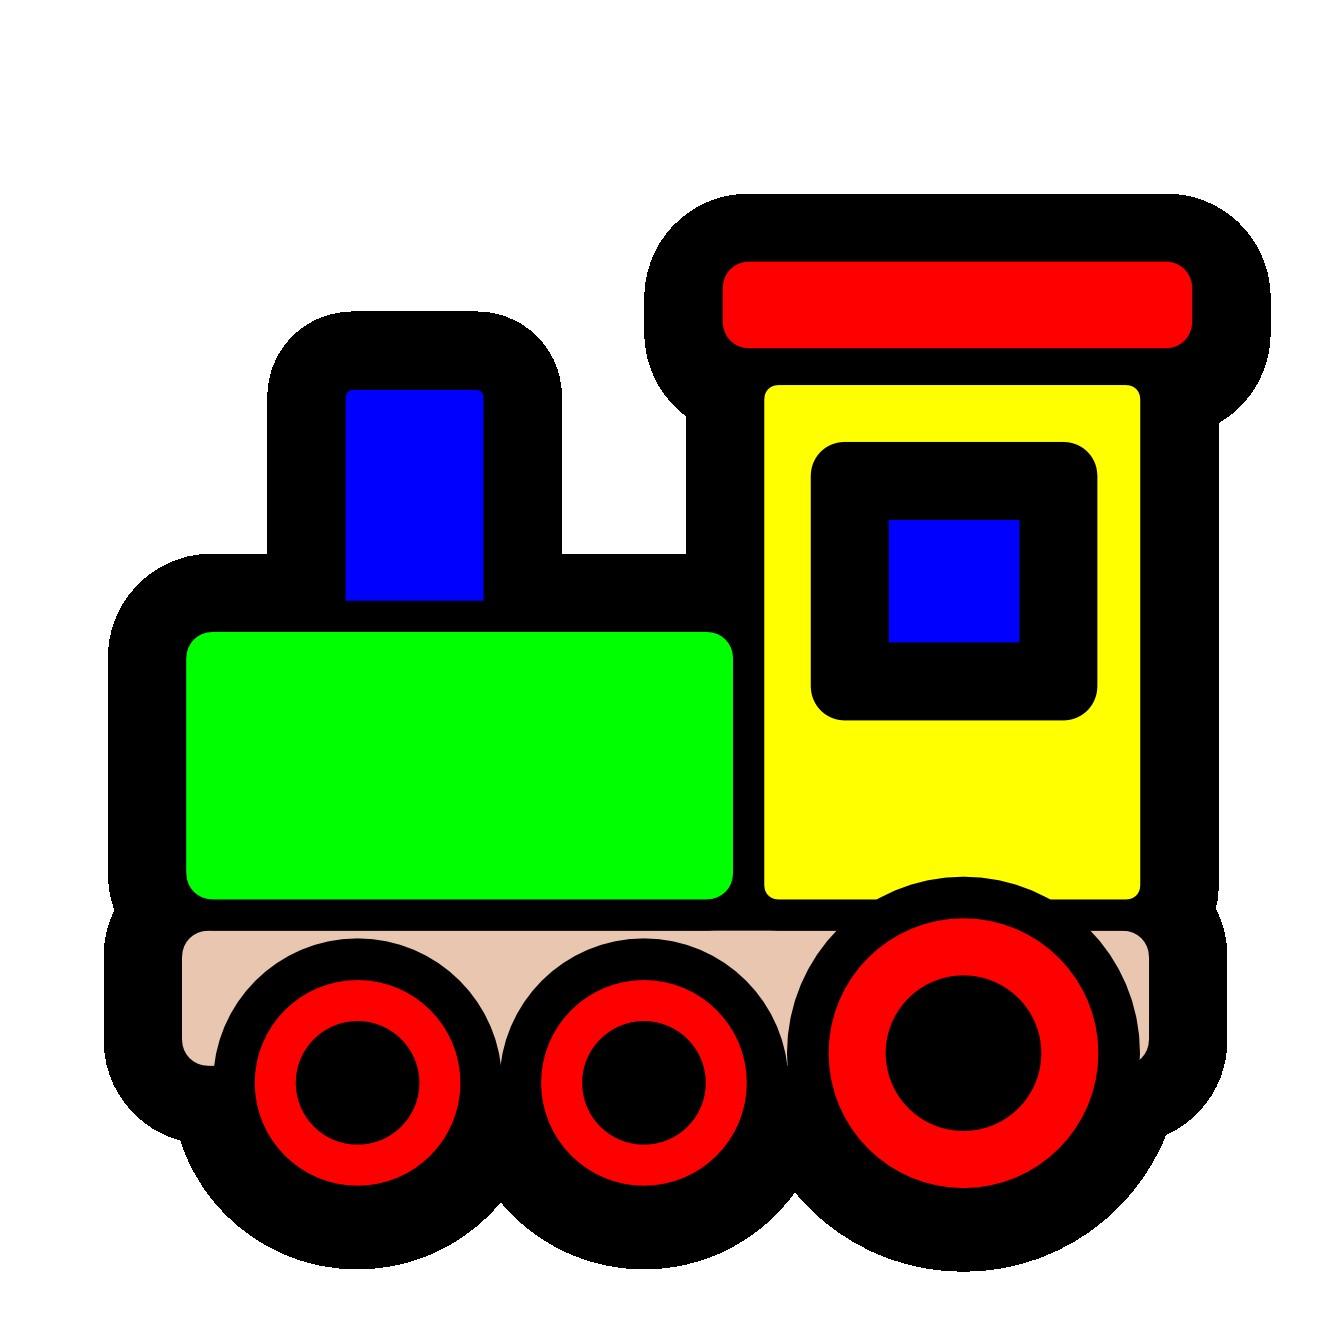 1331x1331 Clever Design Clip Art Train Images Trains Unusual Clipart Png Me